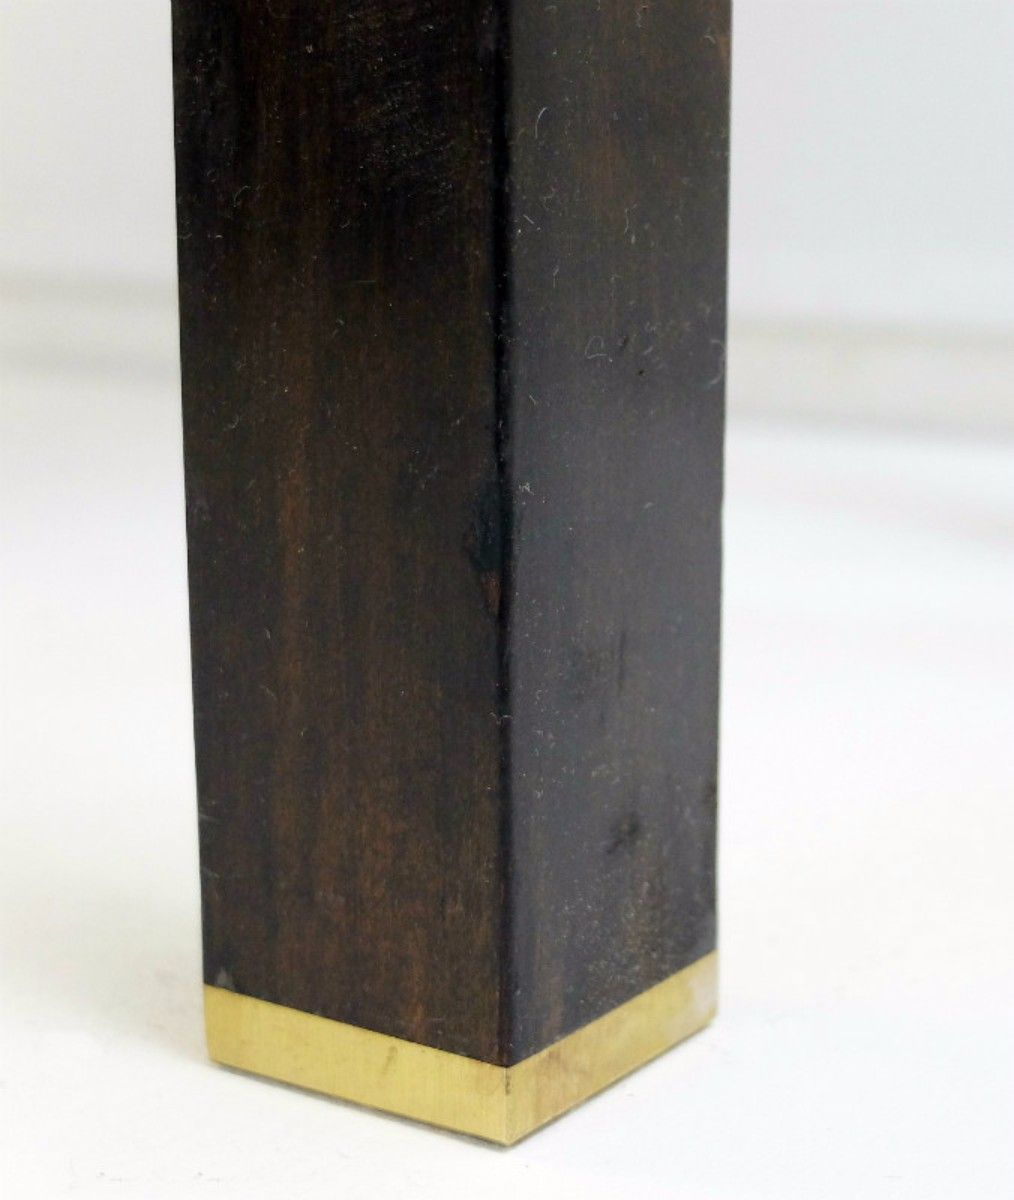 vintage granit holz konsolentisch bei pamono kaufen. Black Bedroom Furniture Sets. Home Design Ideas